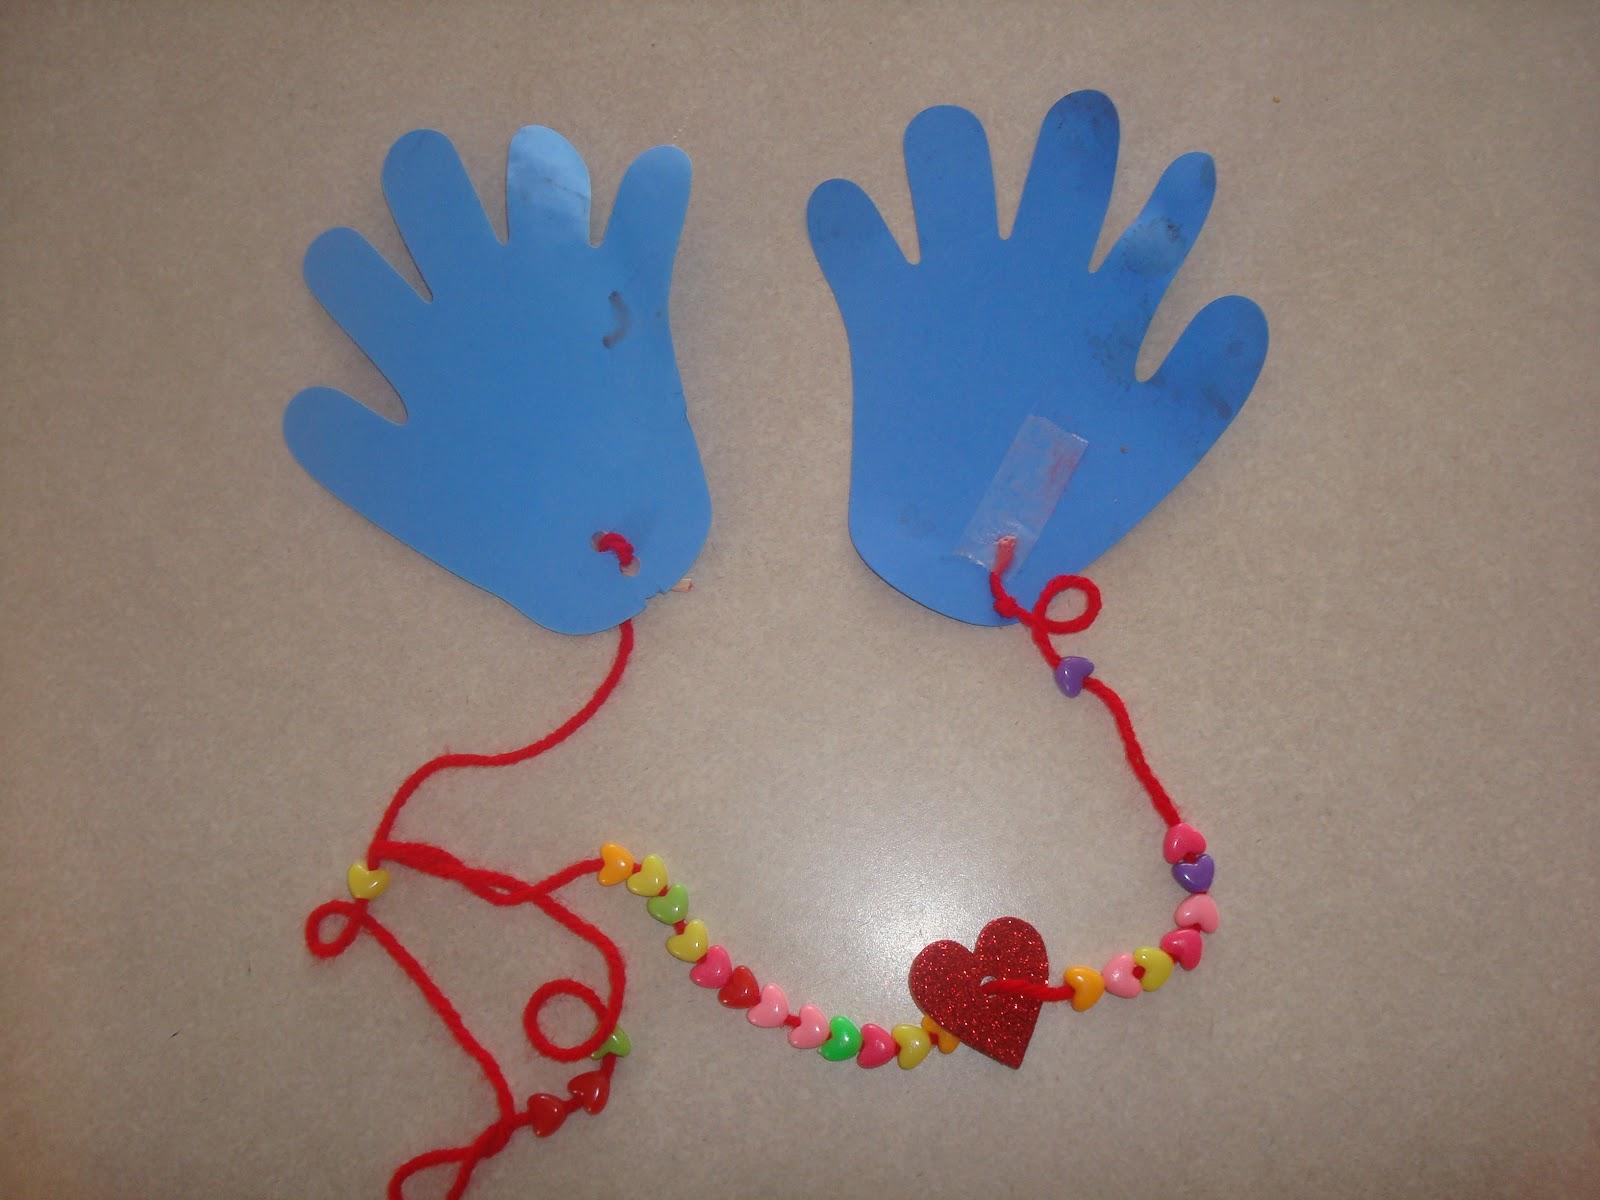 Lovenloot Kindness Craft